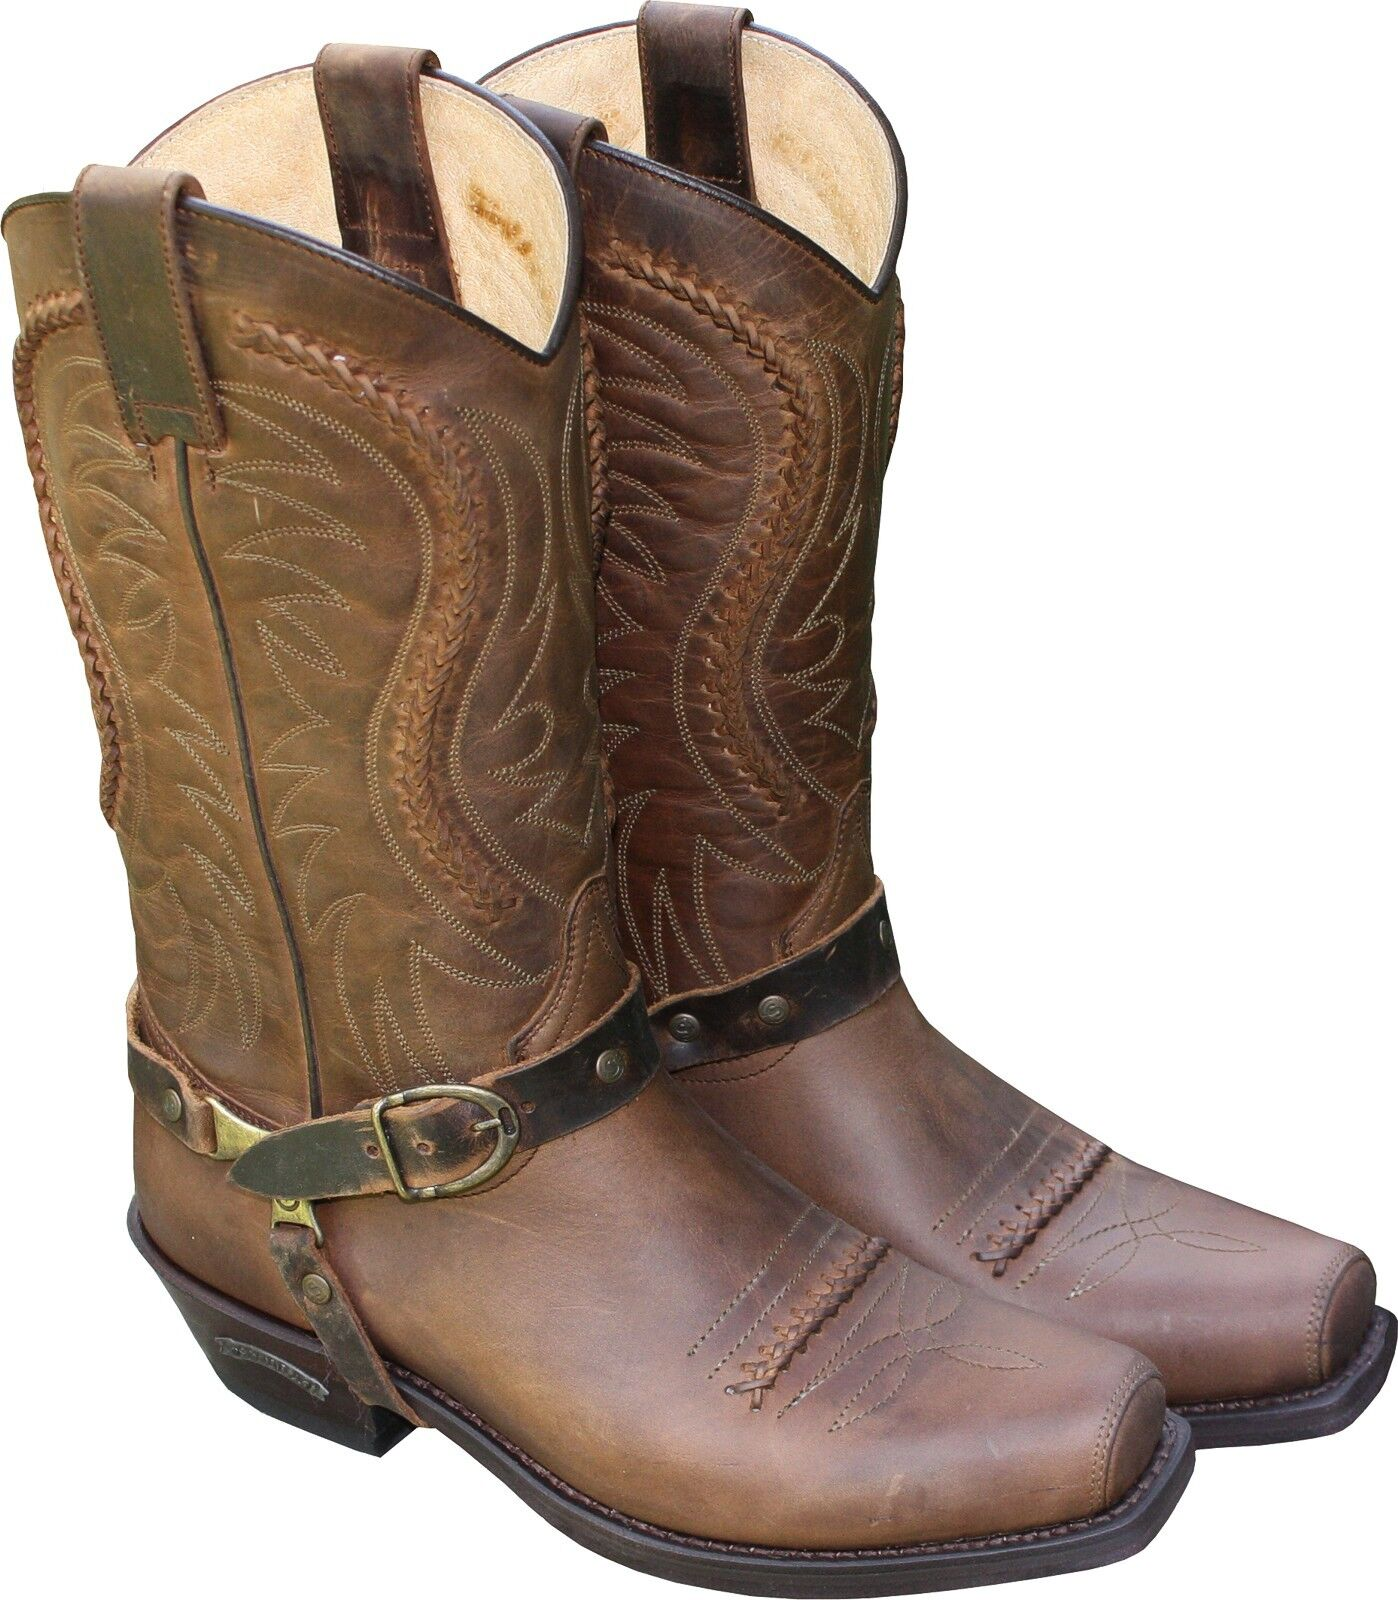 SENDRA STIEFEL Leder Western Braun Country BOOTS Lederstiefel Cowboystiefel